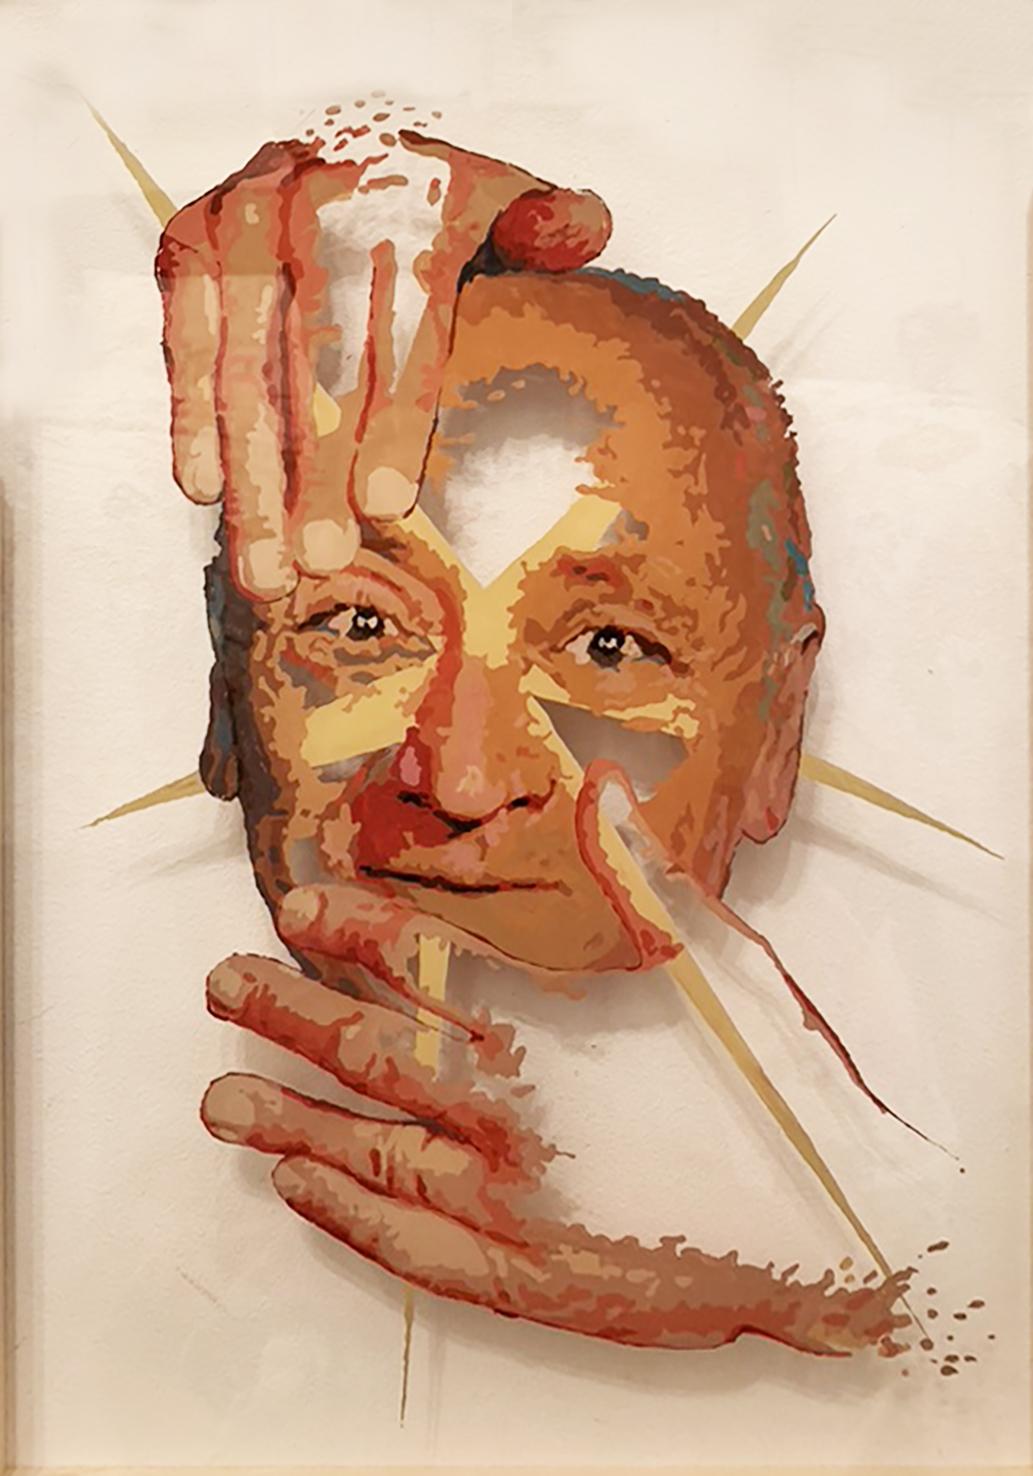 O ZNIKANIU | Bogdan Hussakowski, 50 x 35, akryl na pleksi, 2021